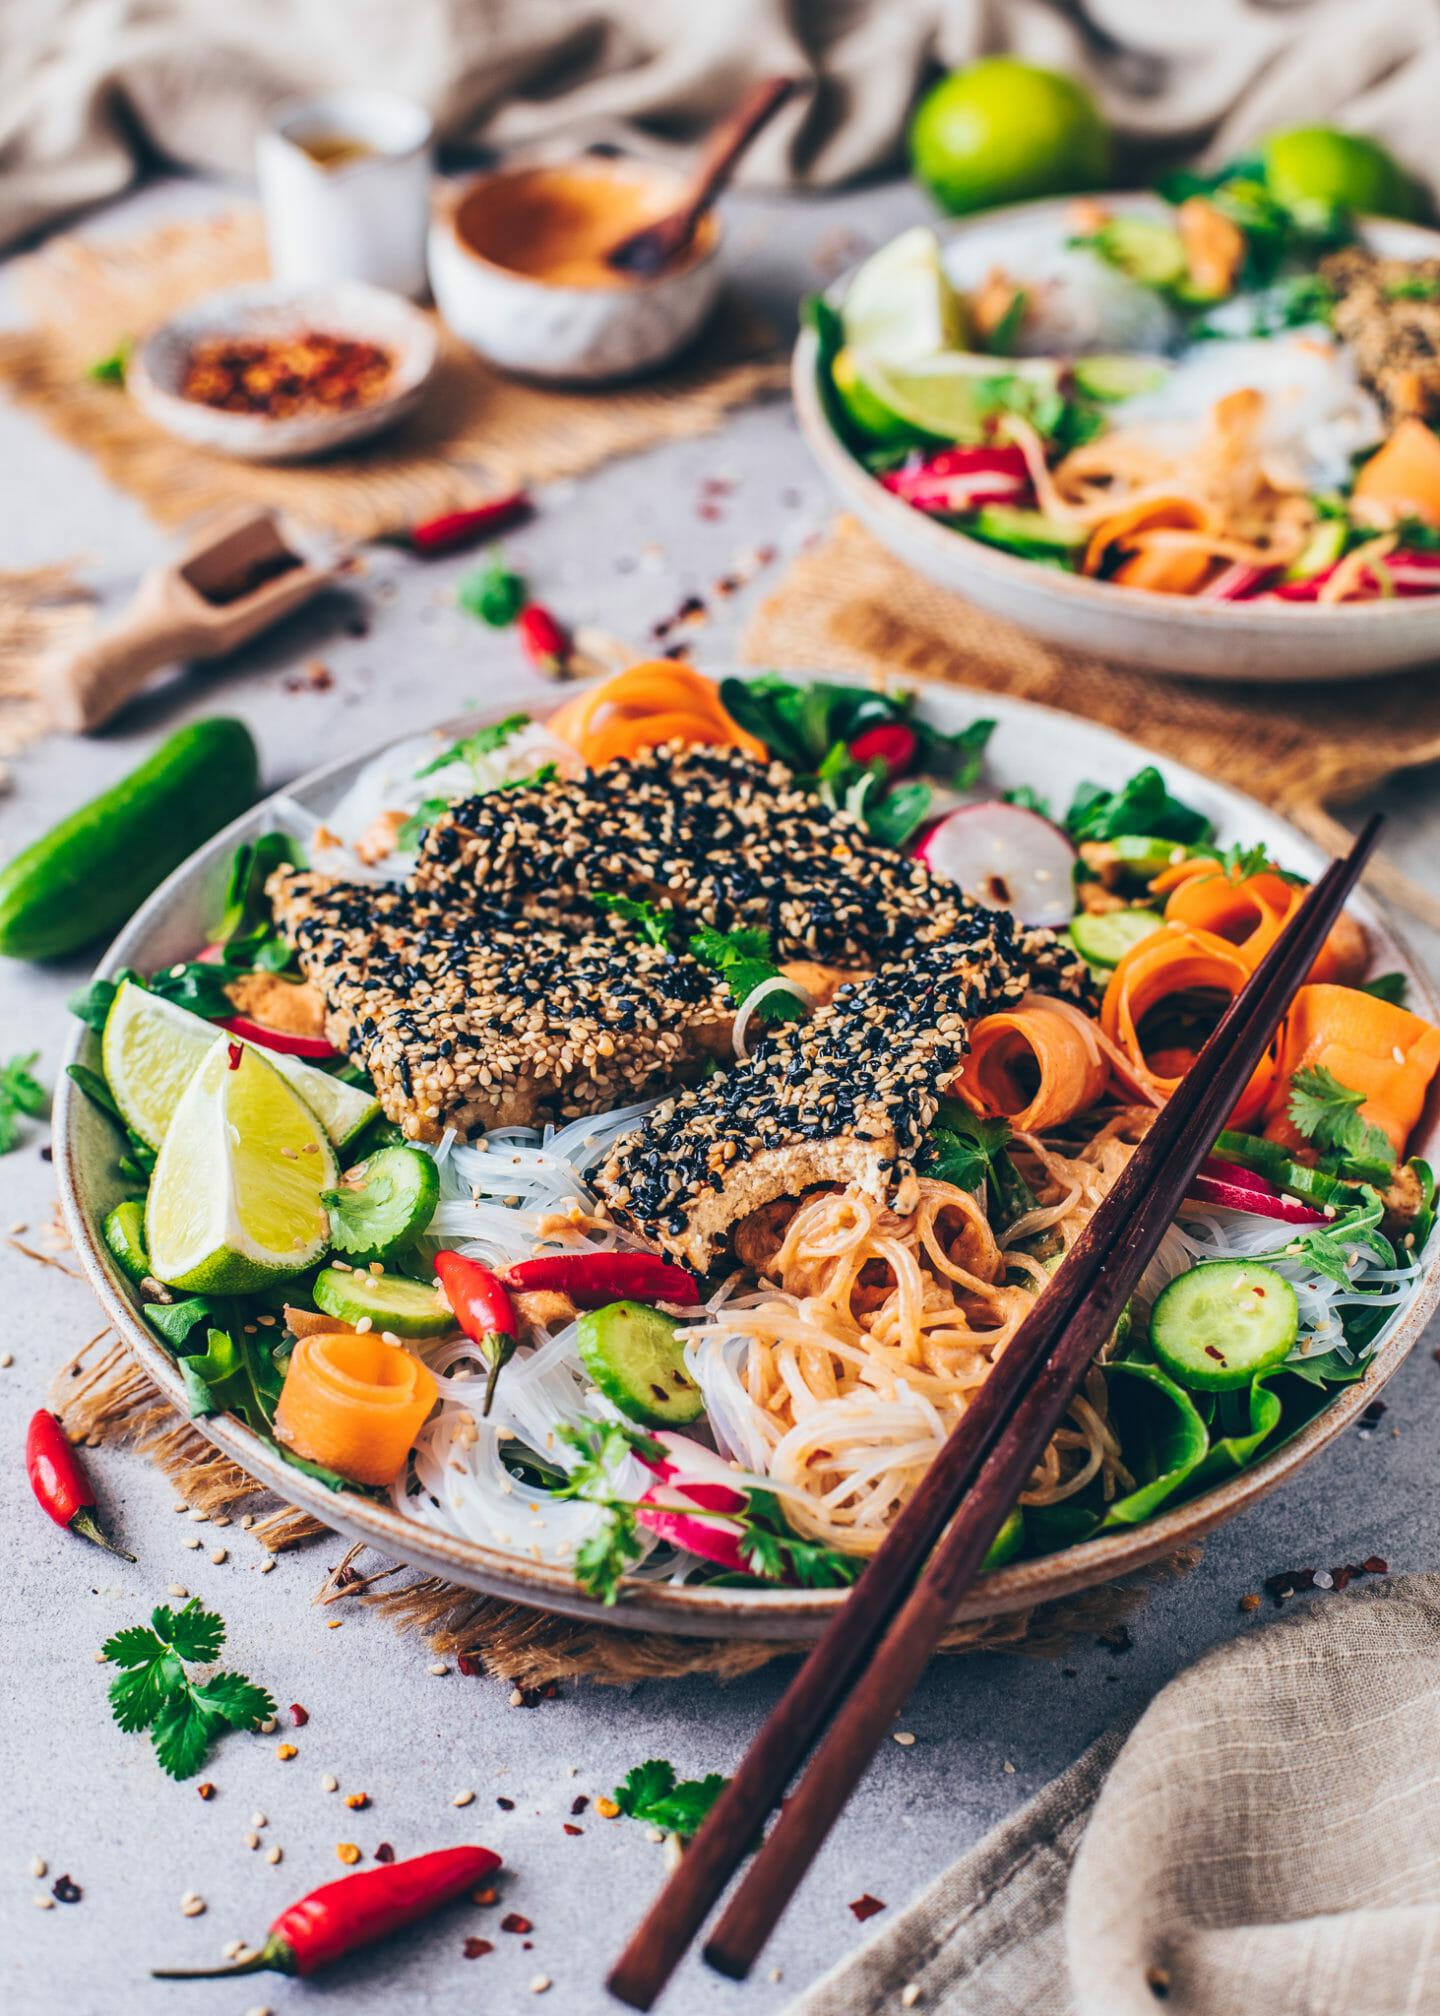 Thai Salad Bowl with rice noodles, crispy sesame tofu, carrots, radishes, lettuce, lemon, chili and peanut sauce dressing